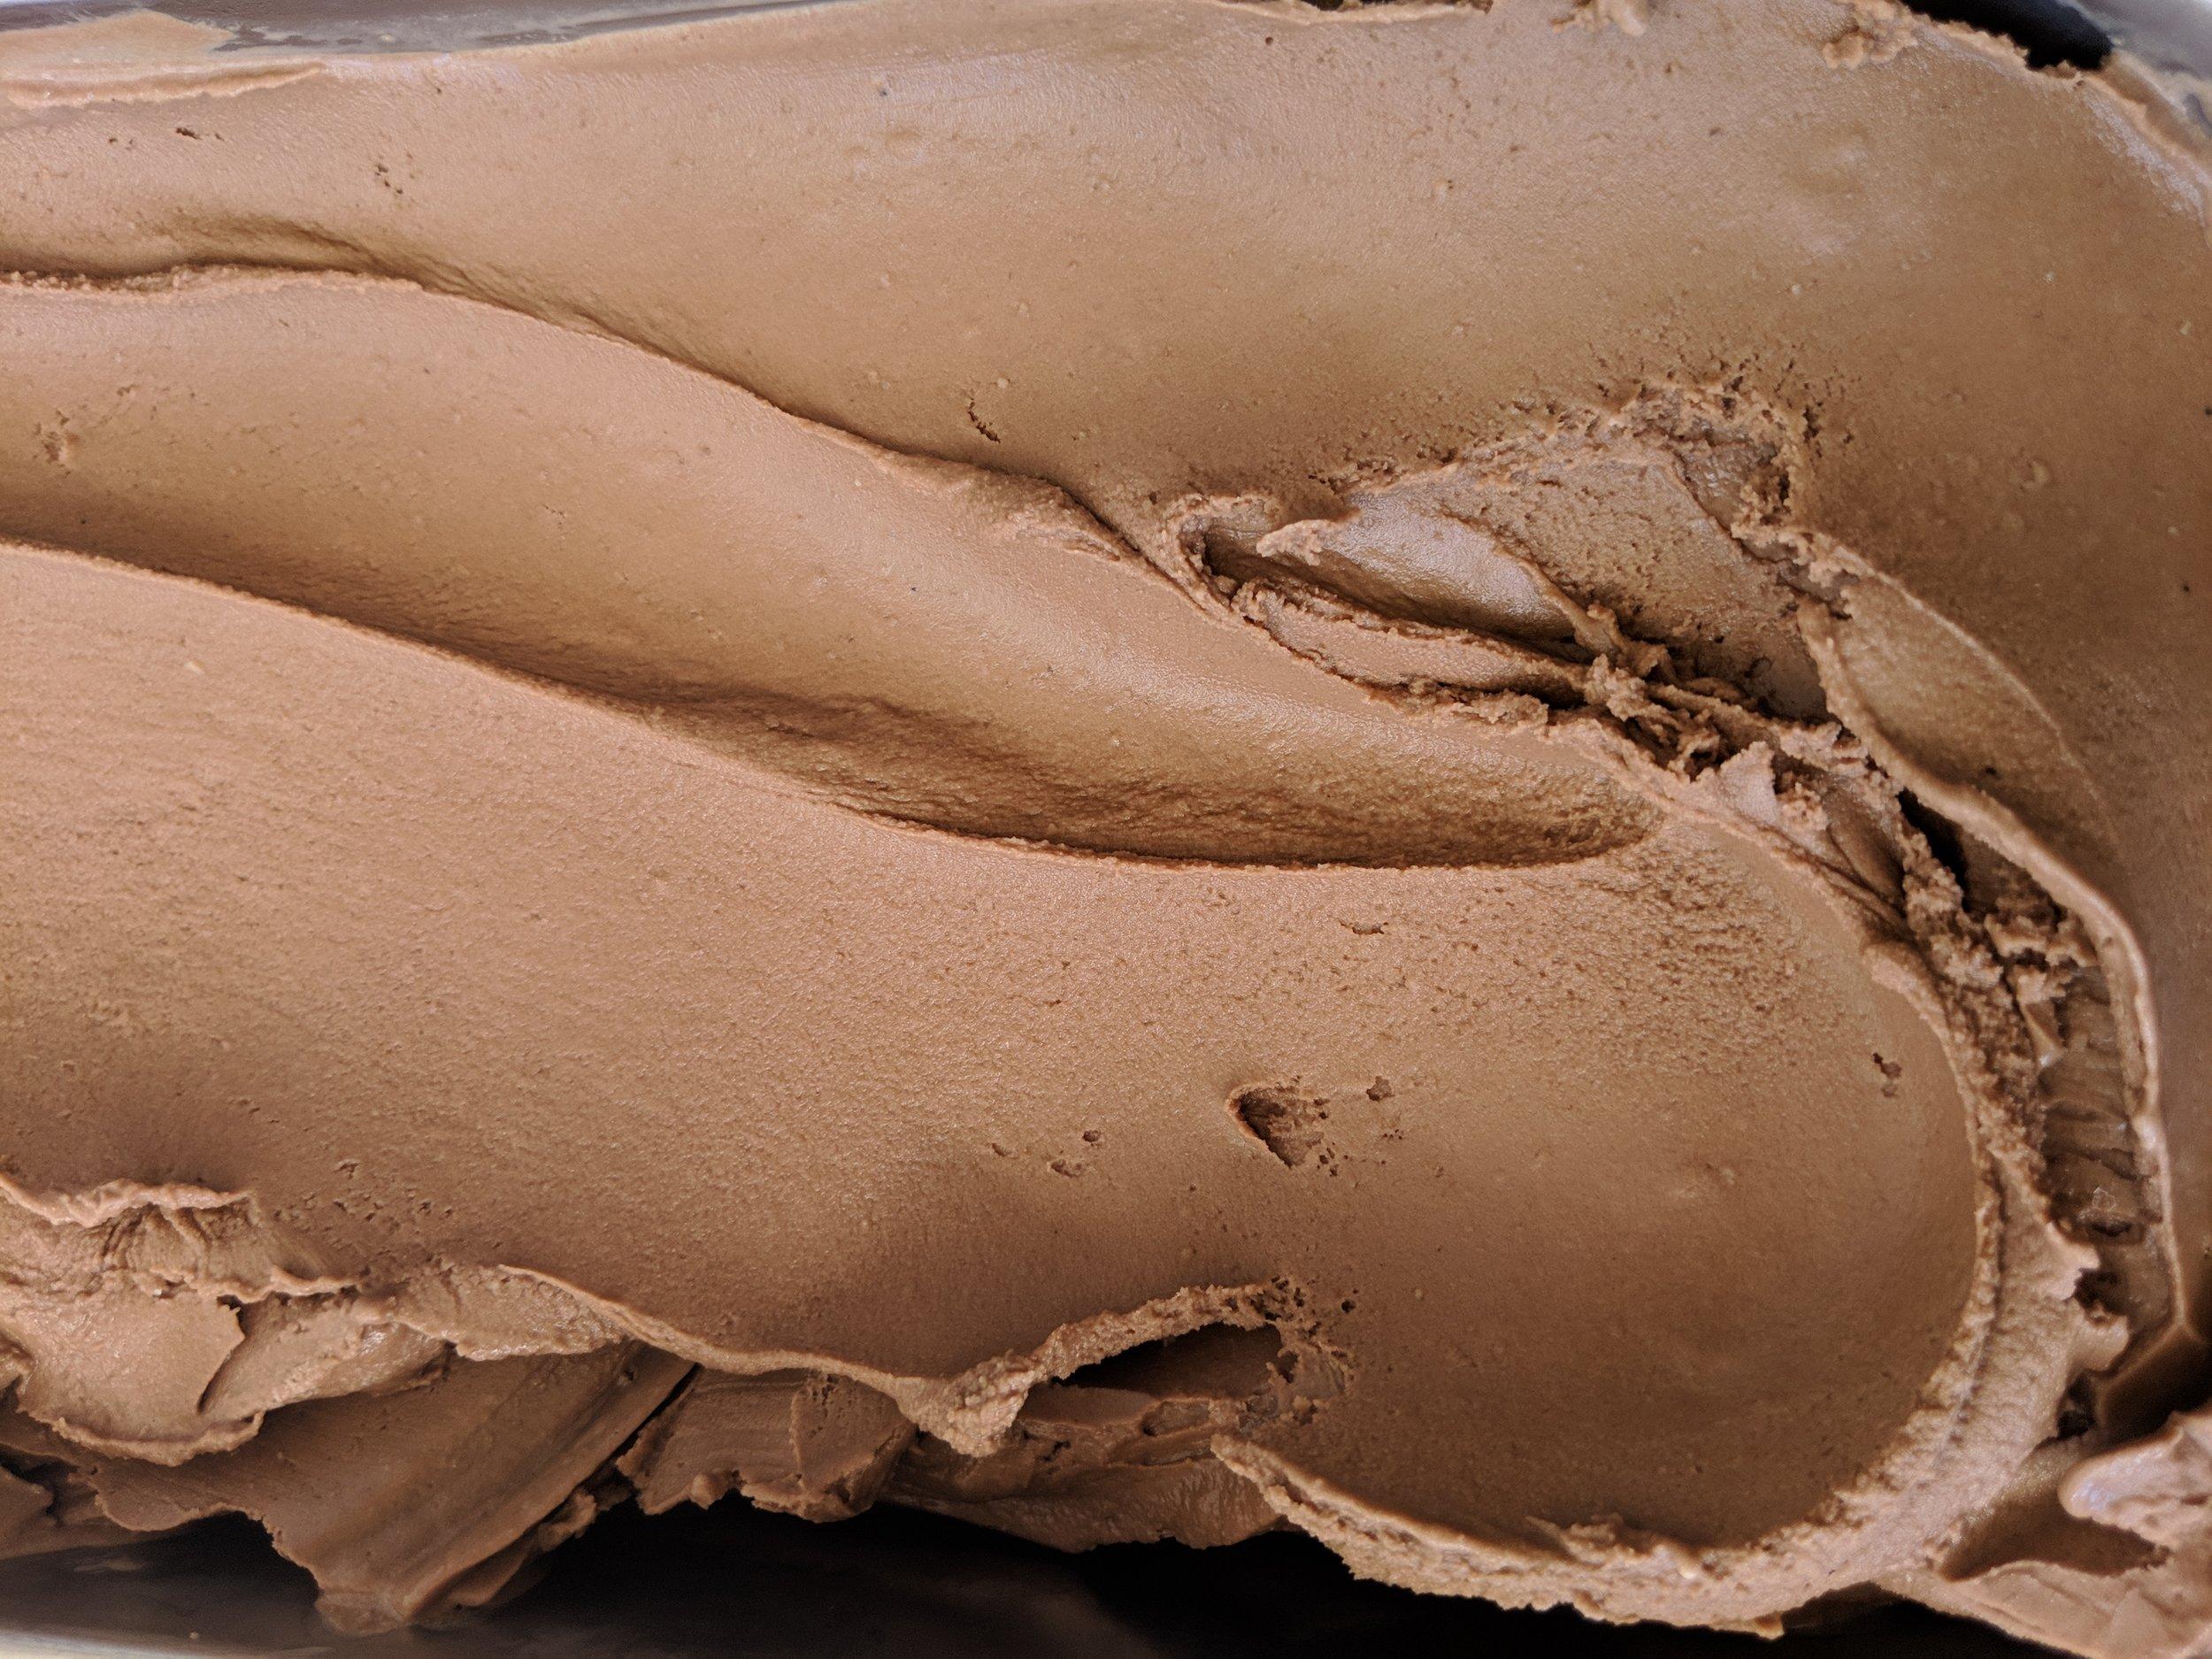 Vegan Chocolate Haupia looking all decadent